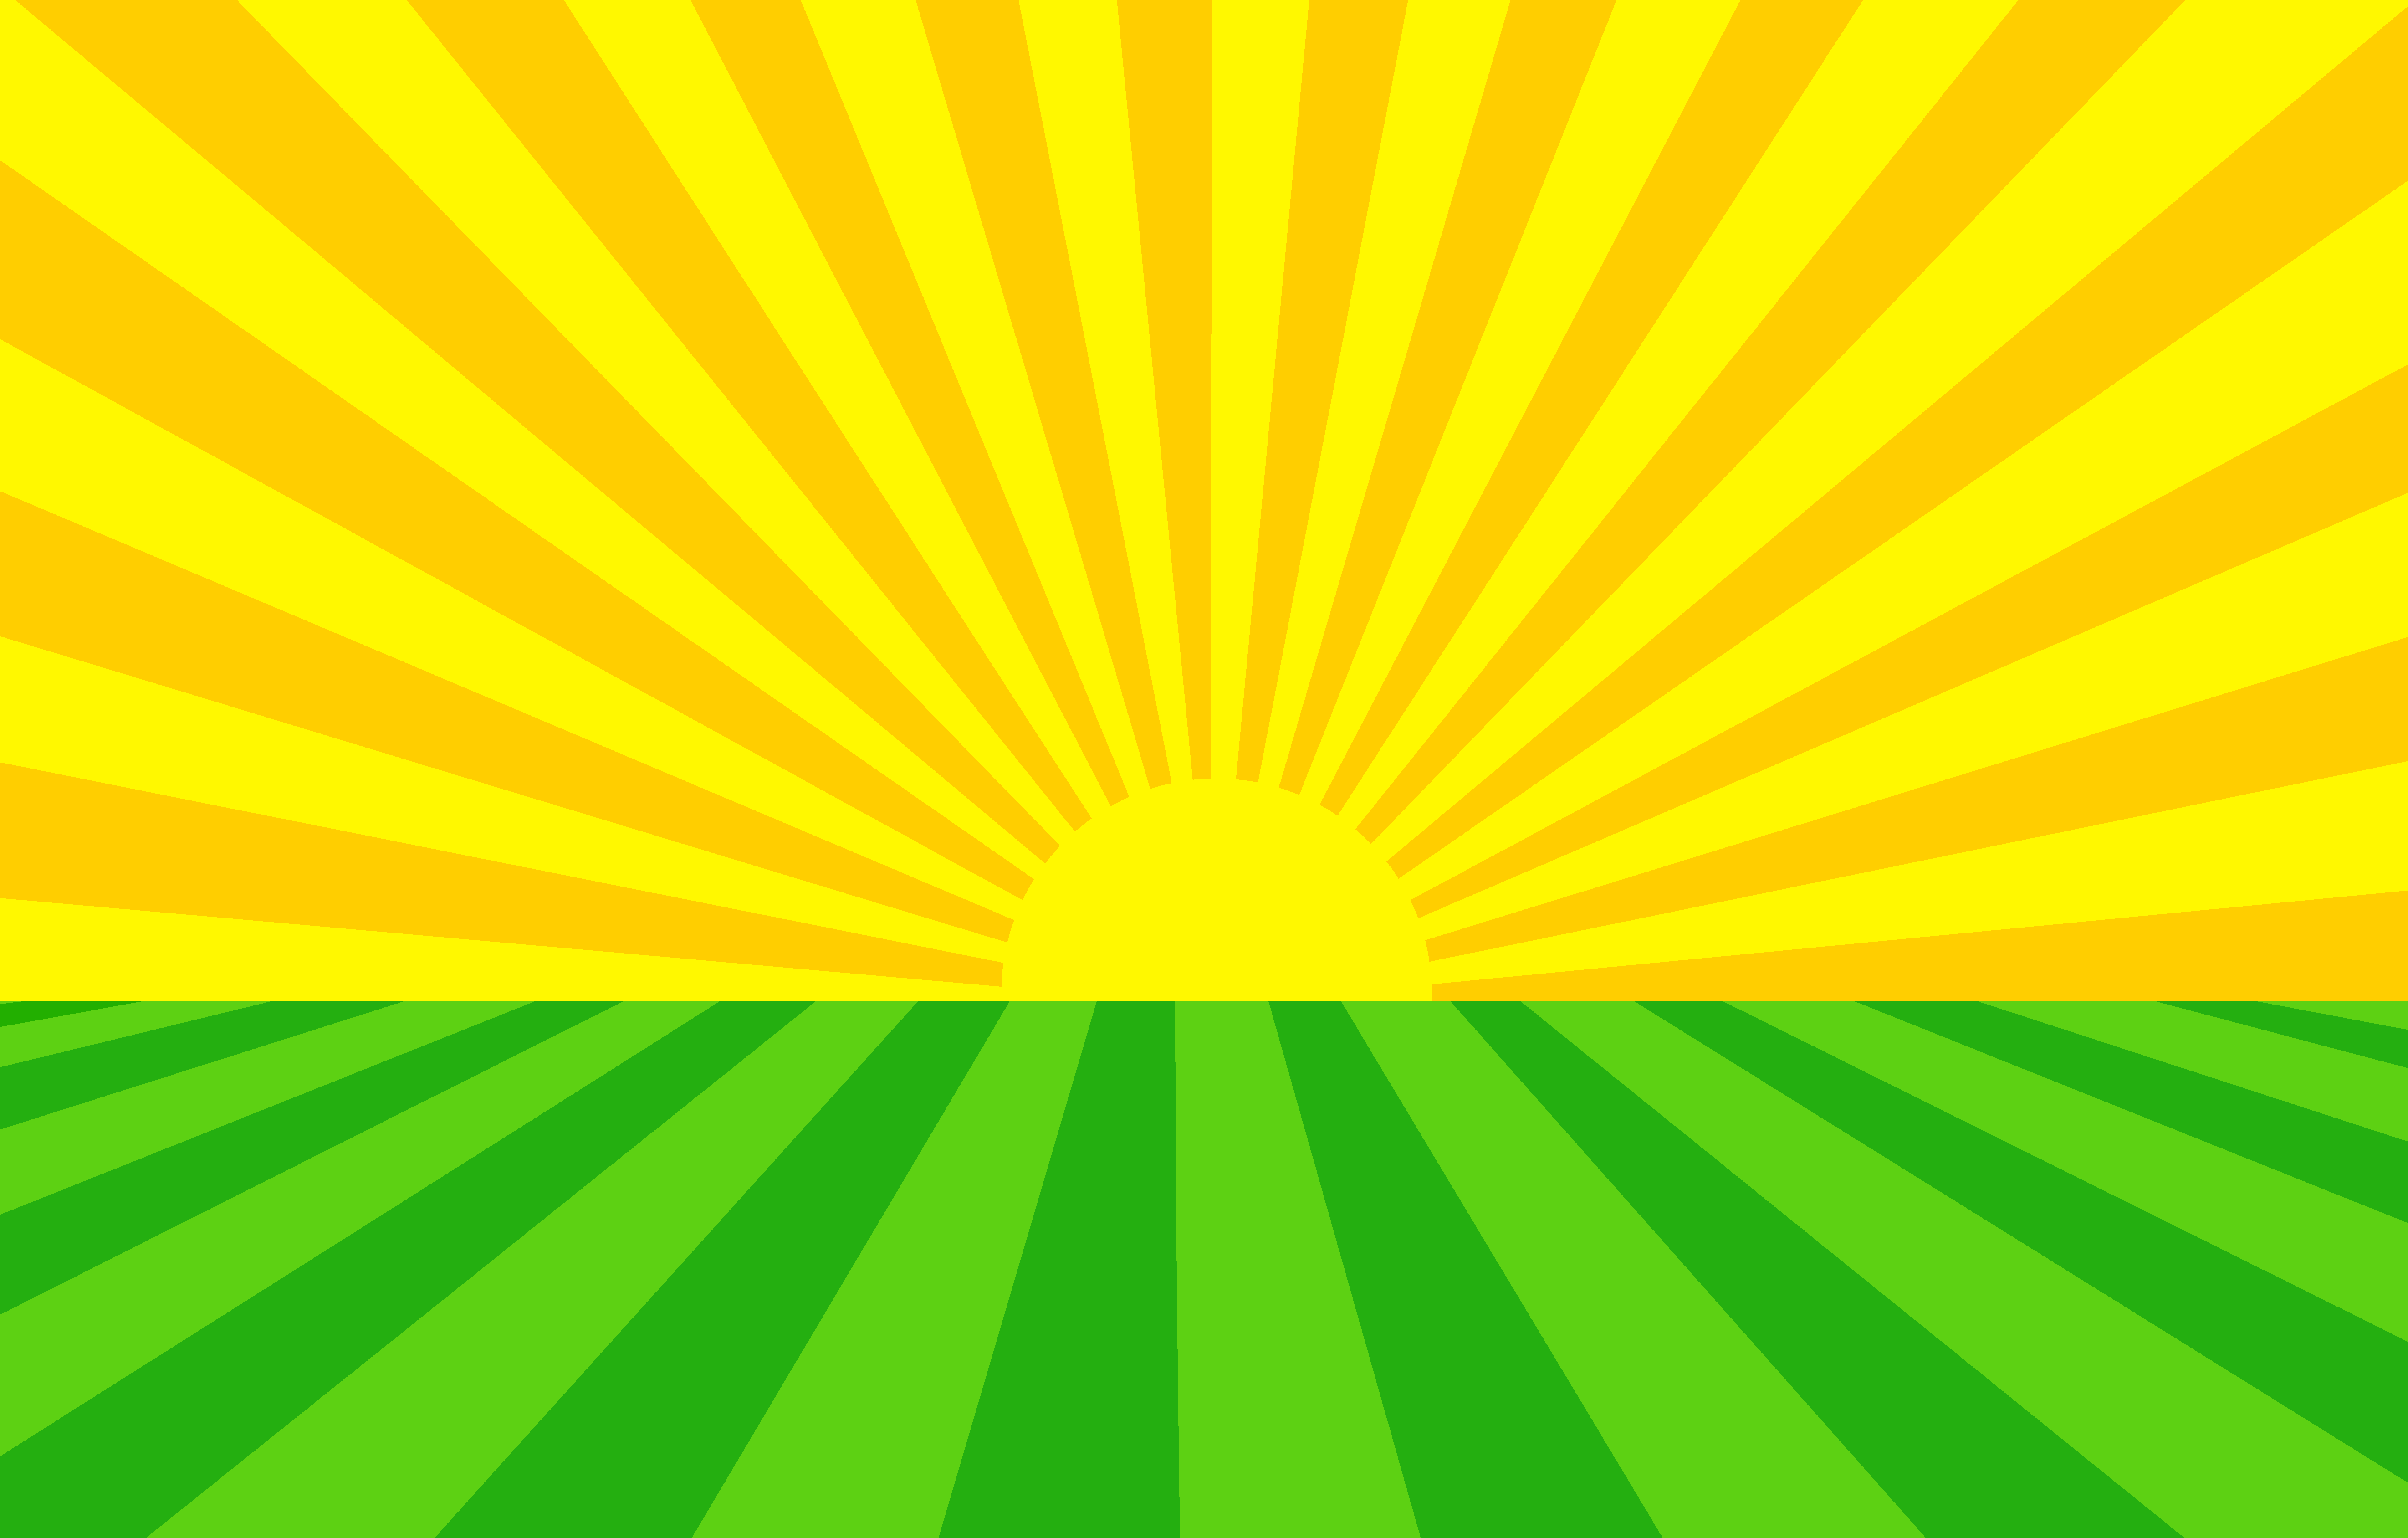 Sunrise Clipart - Sunrise Clipart